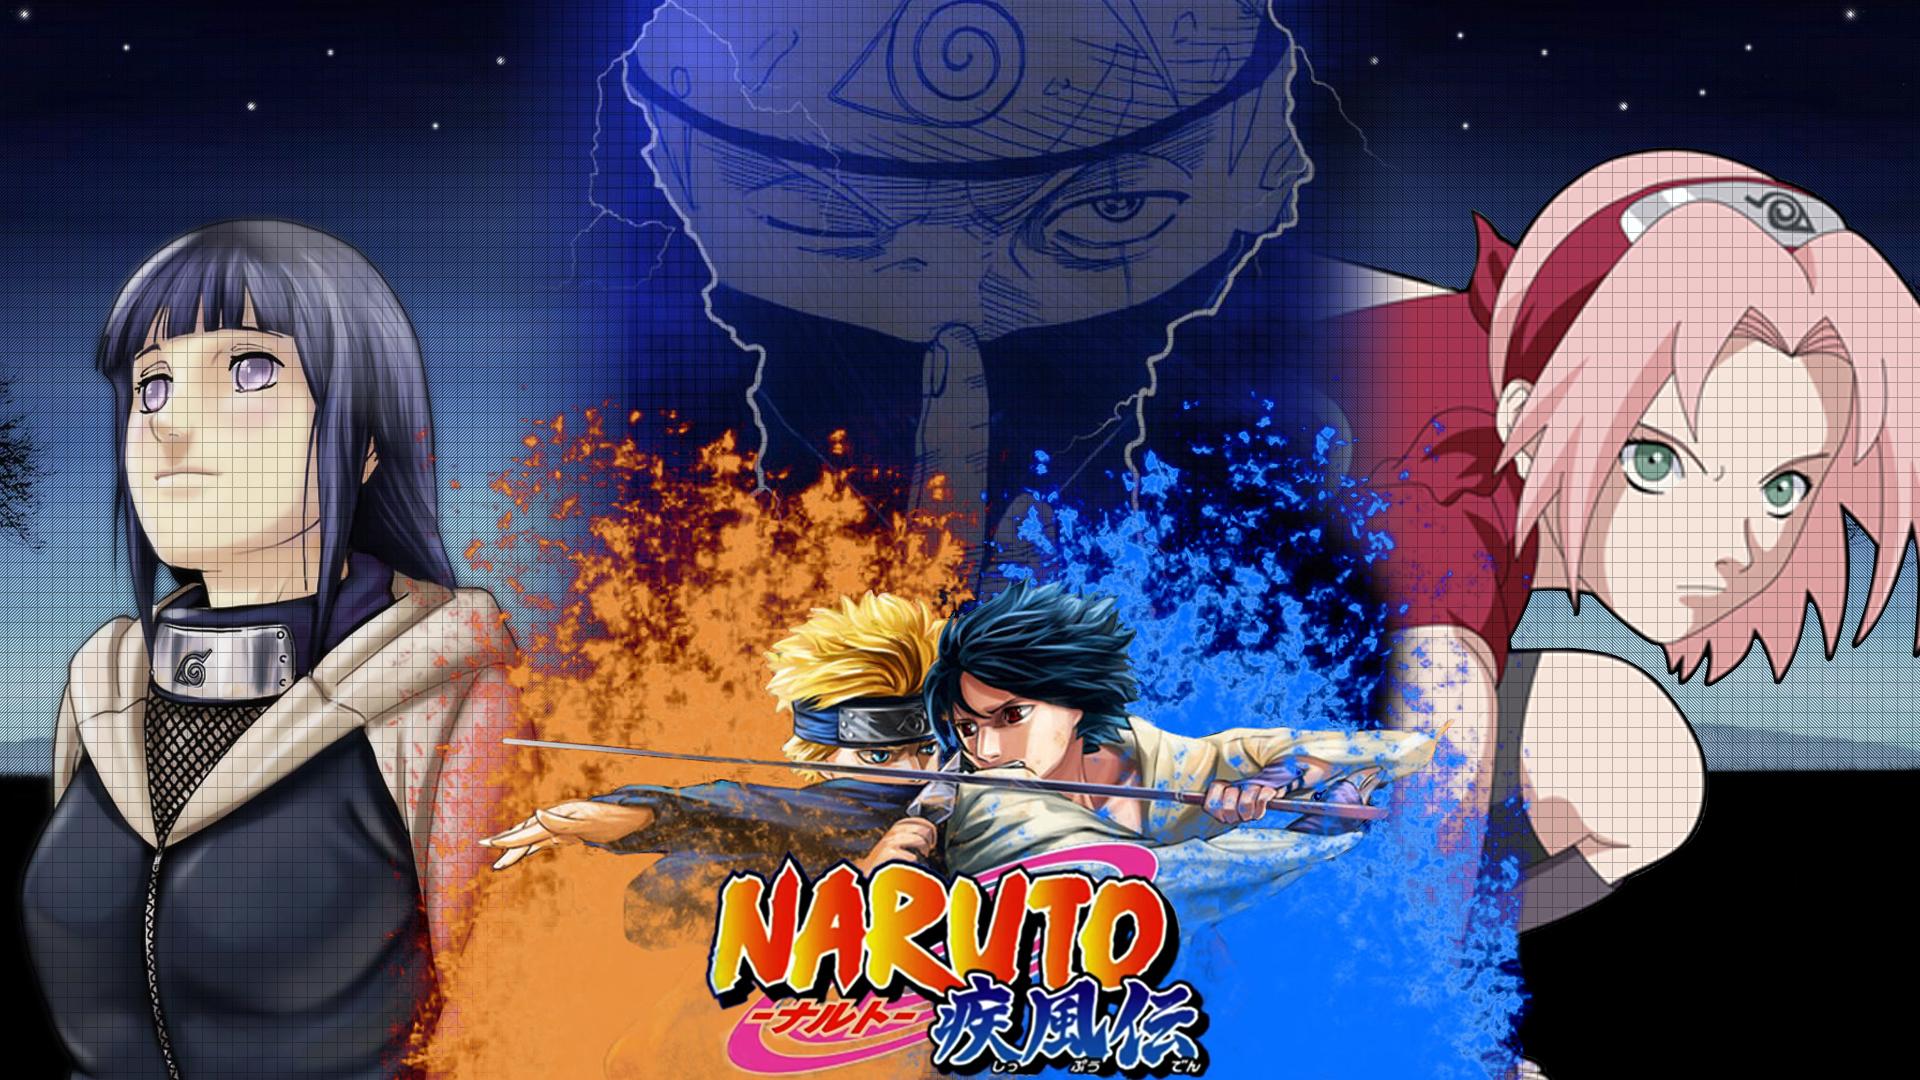 Naruto Computer Wallpapers Desktop Backgrounds 1920x1080 ID72713 1920x1080